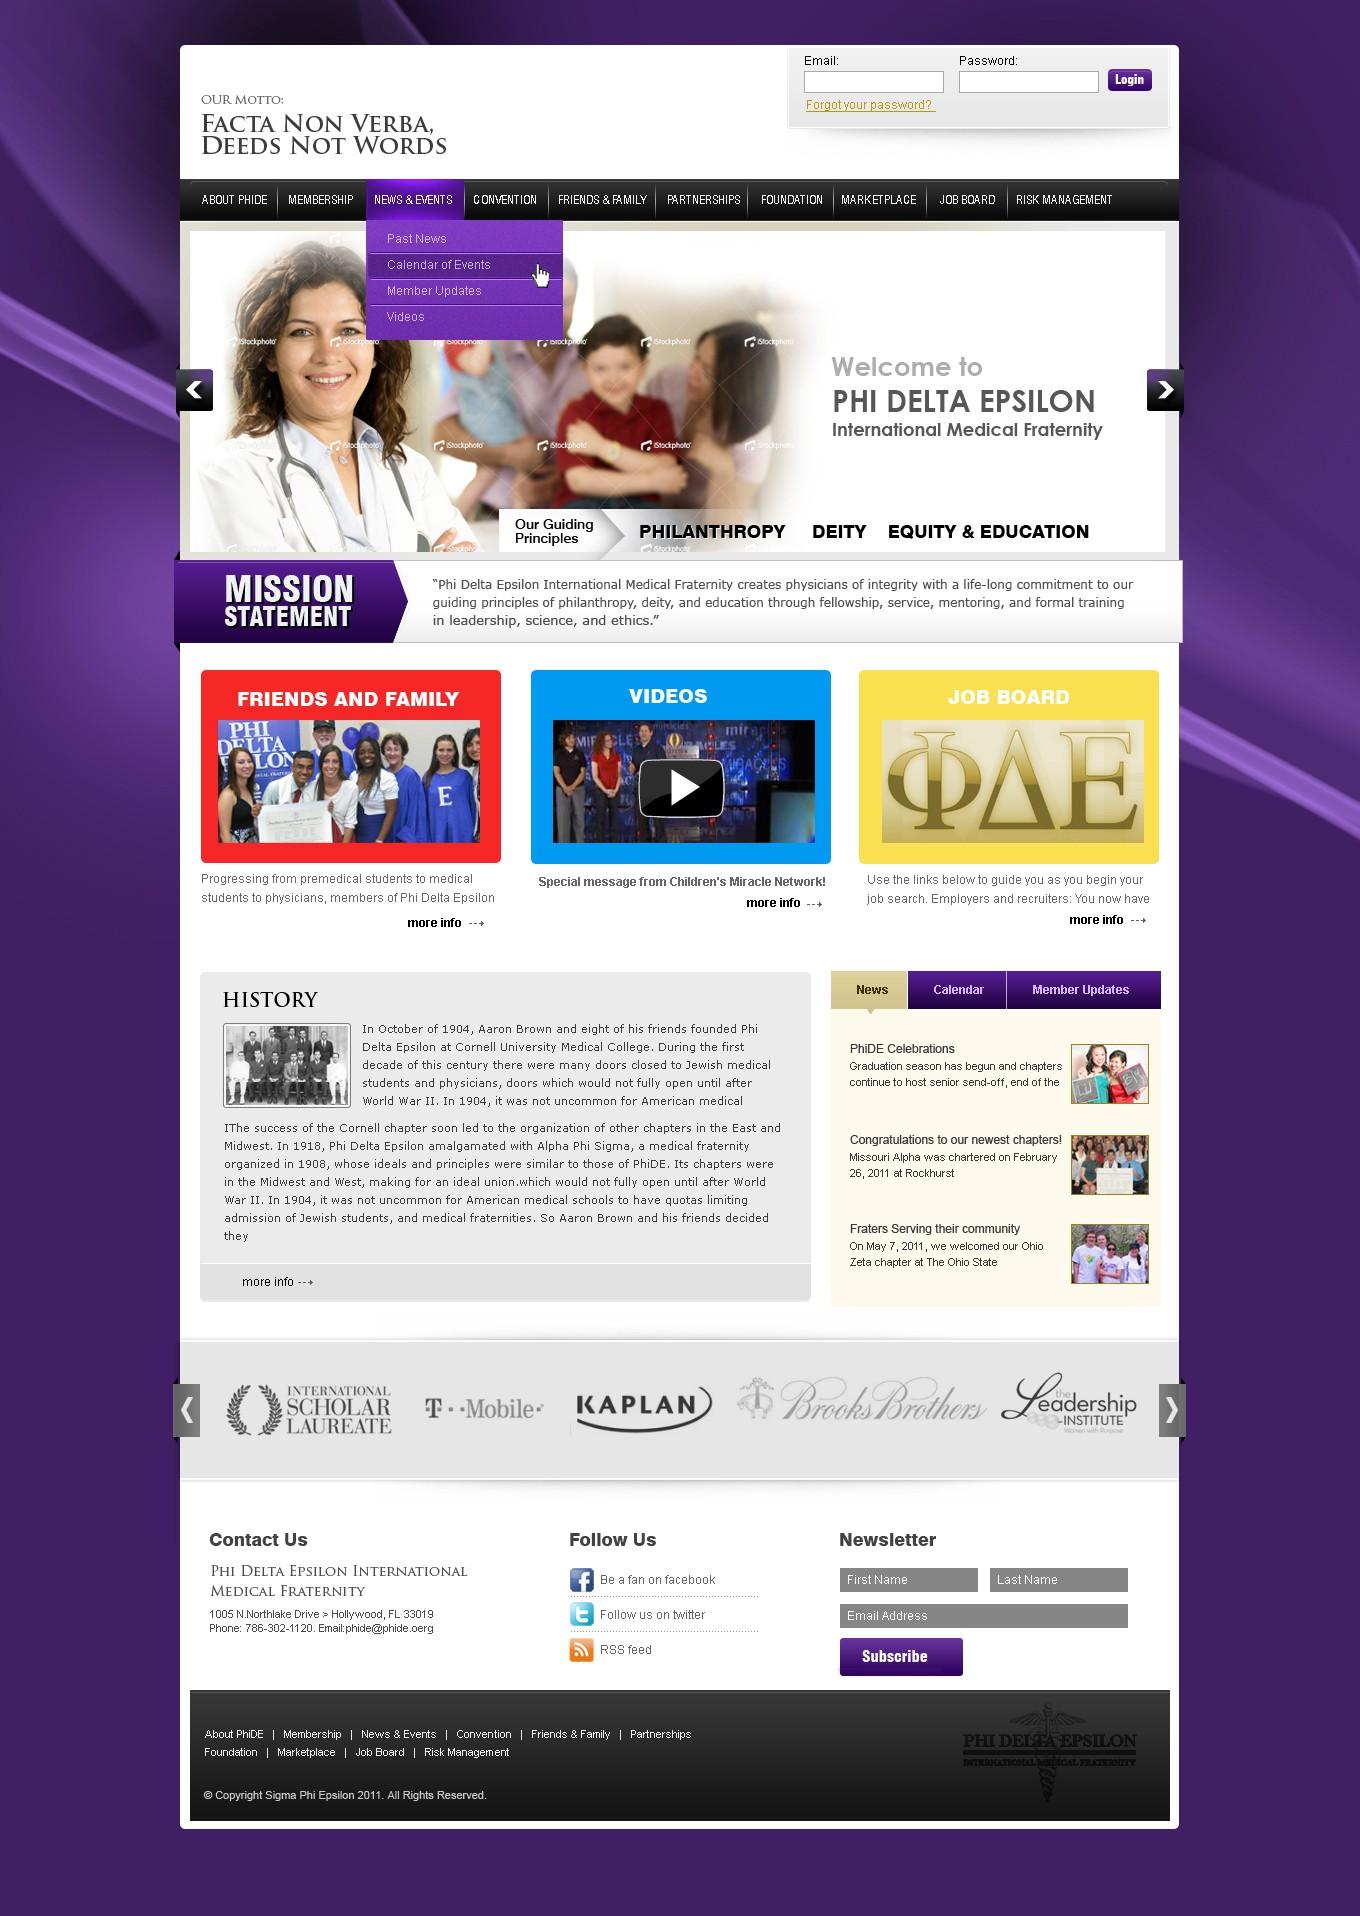 New website design wanted for Phi Delta Epsilon